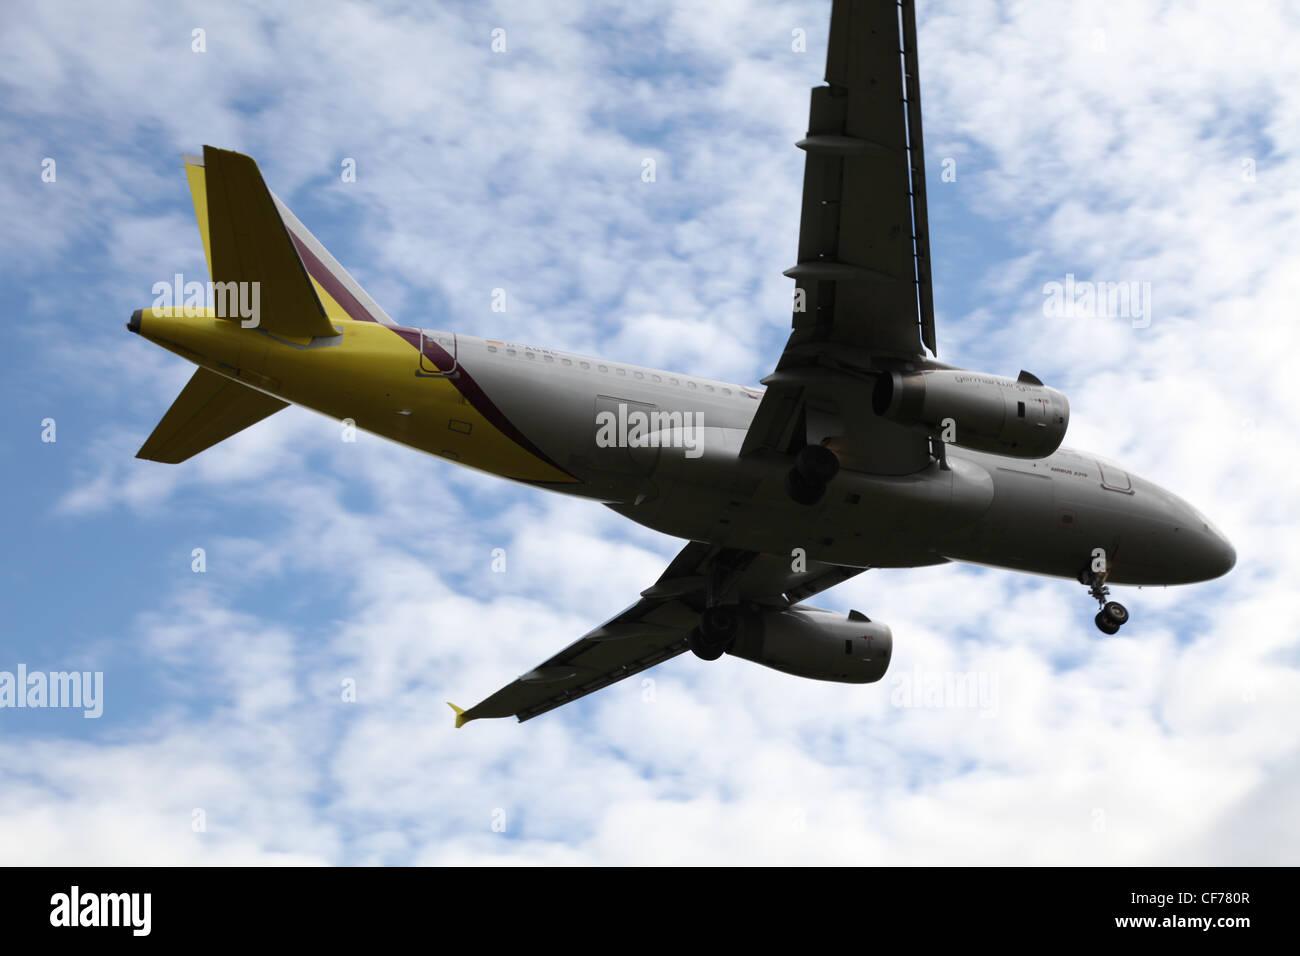 Flugzeug in einem bewölkten Himmel, Flugzeug bin Bewölkten Himmel Stockbild